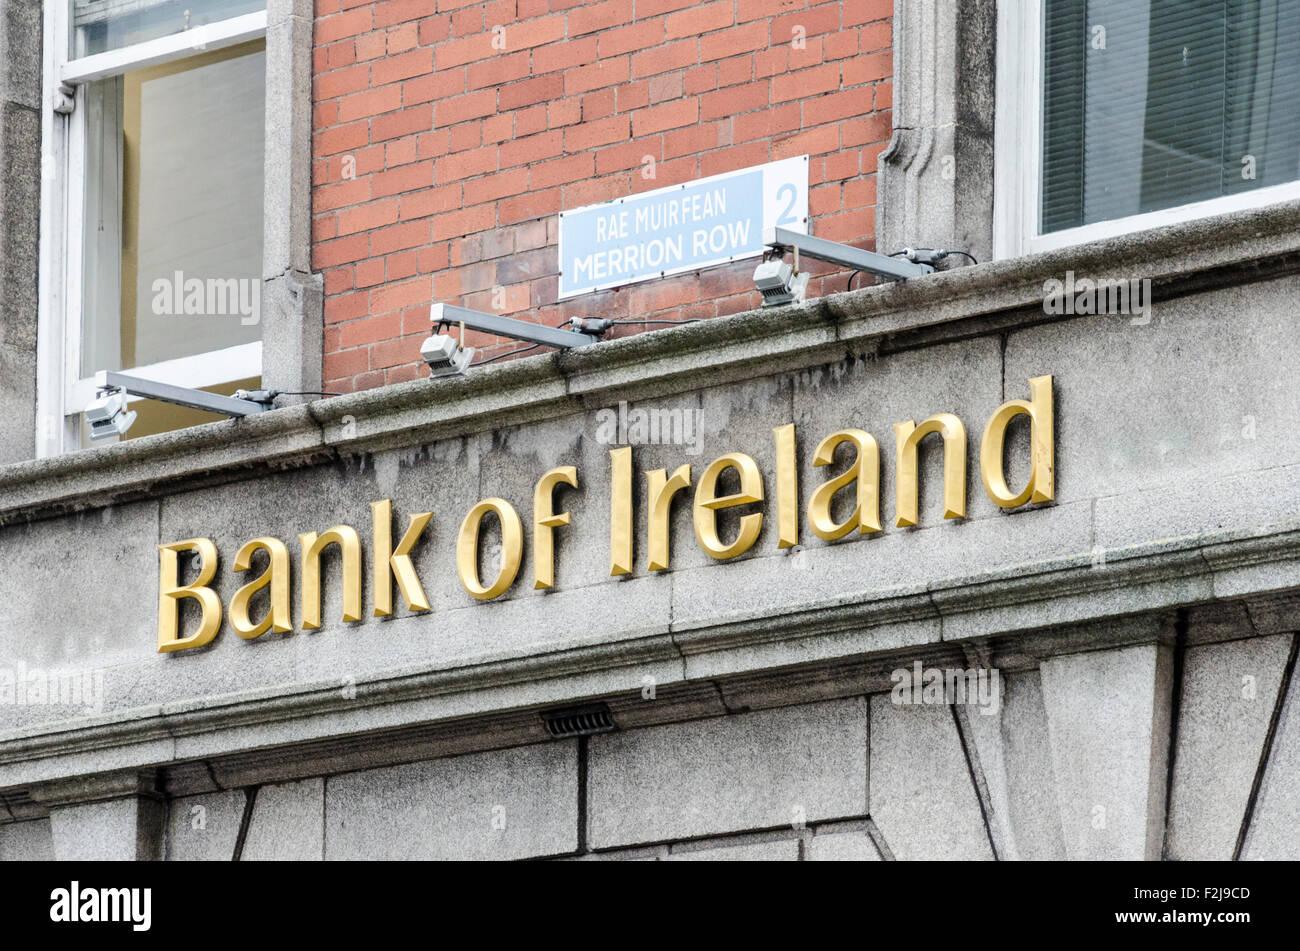 Bank of Ireland branch in Dublin, Ireland - Stock Image